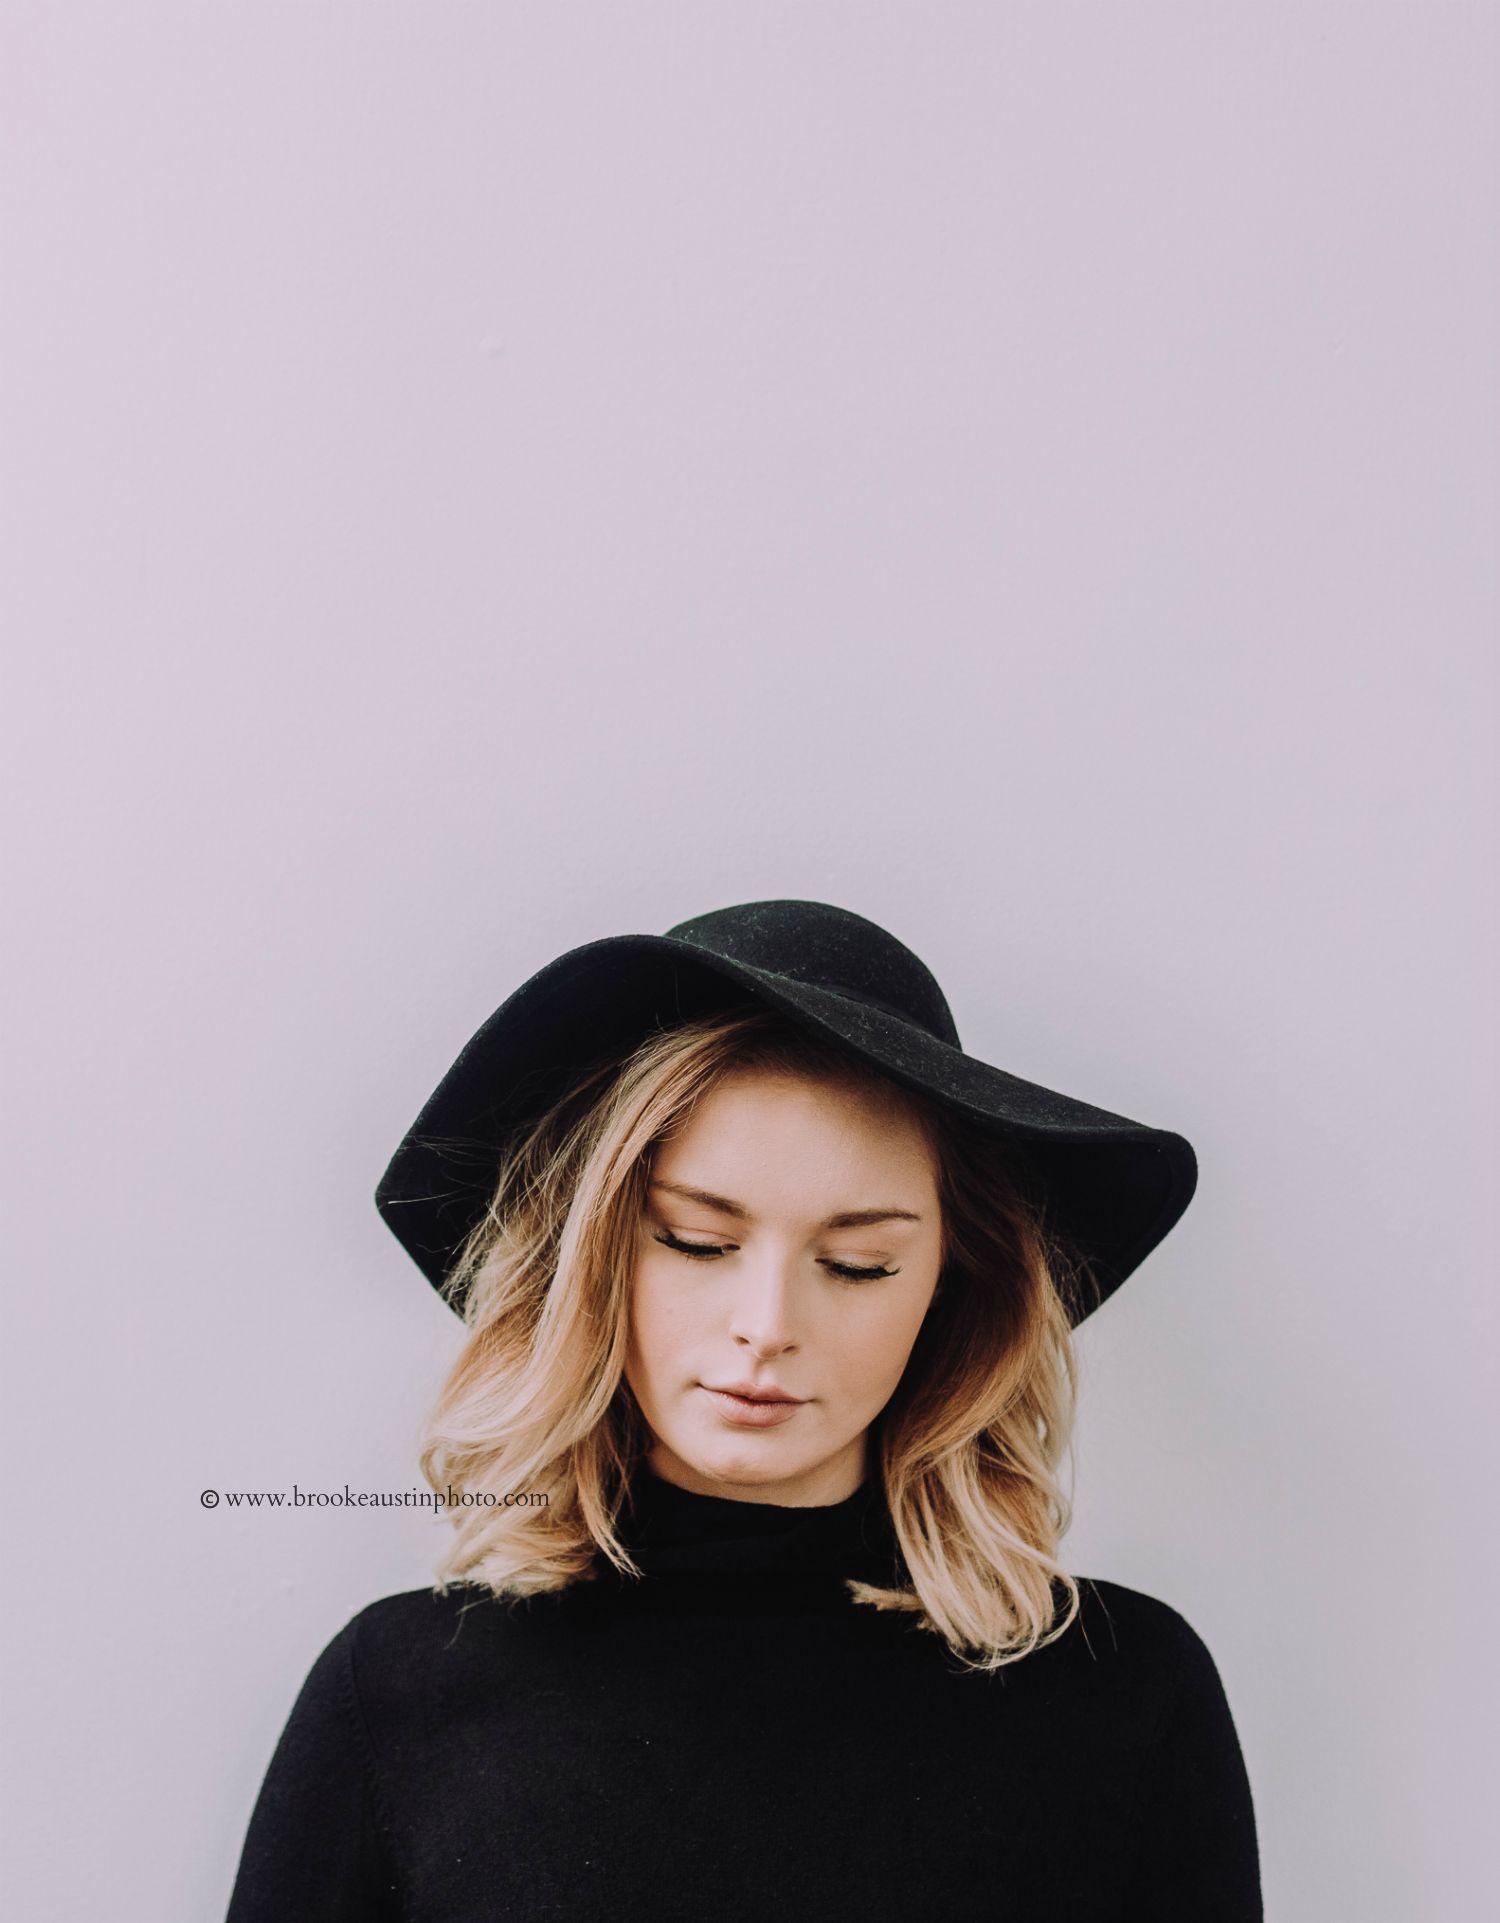 Chloe b professional headshots women creative portrait